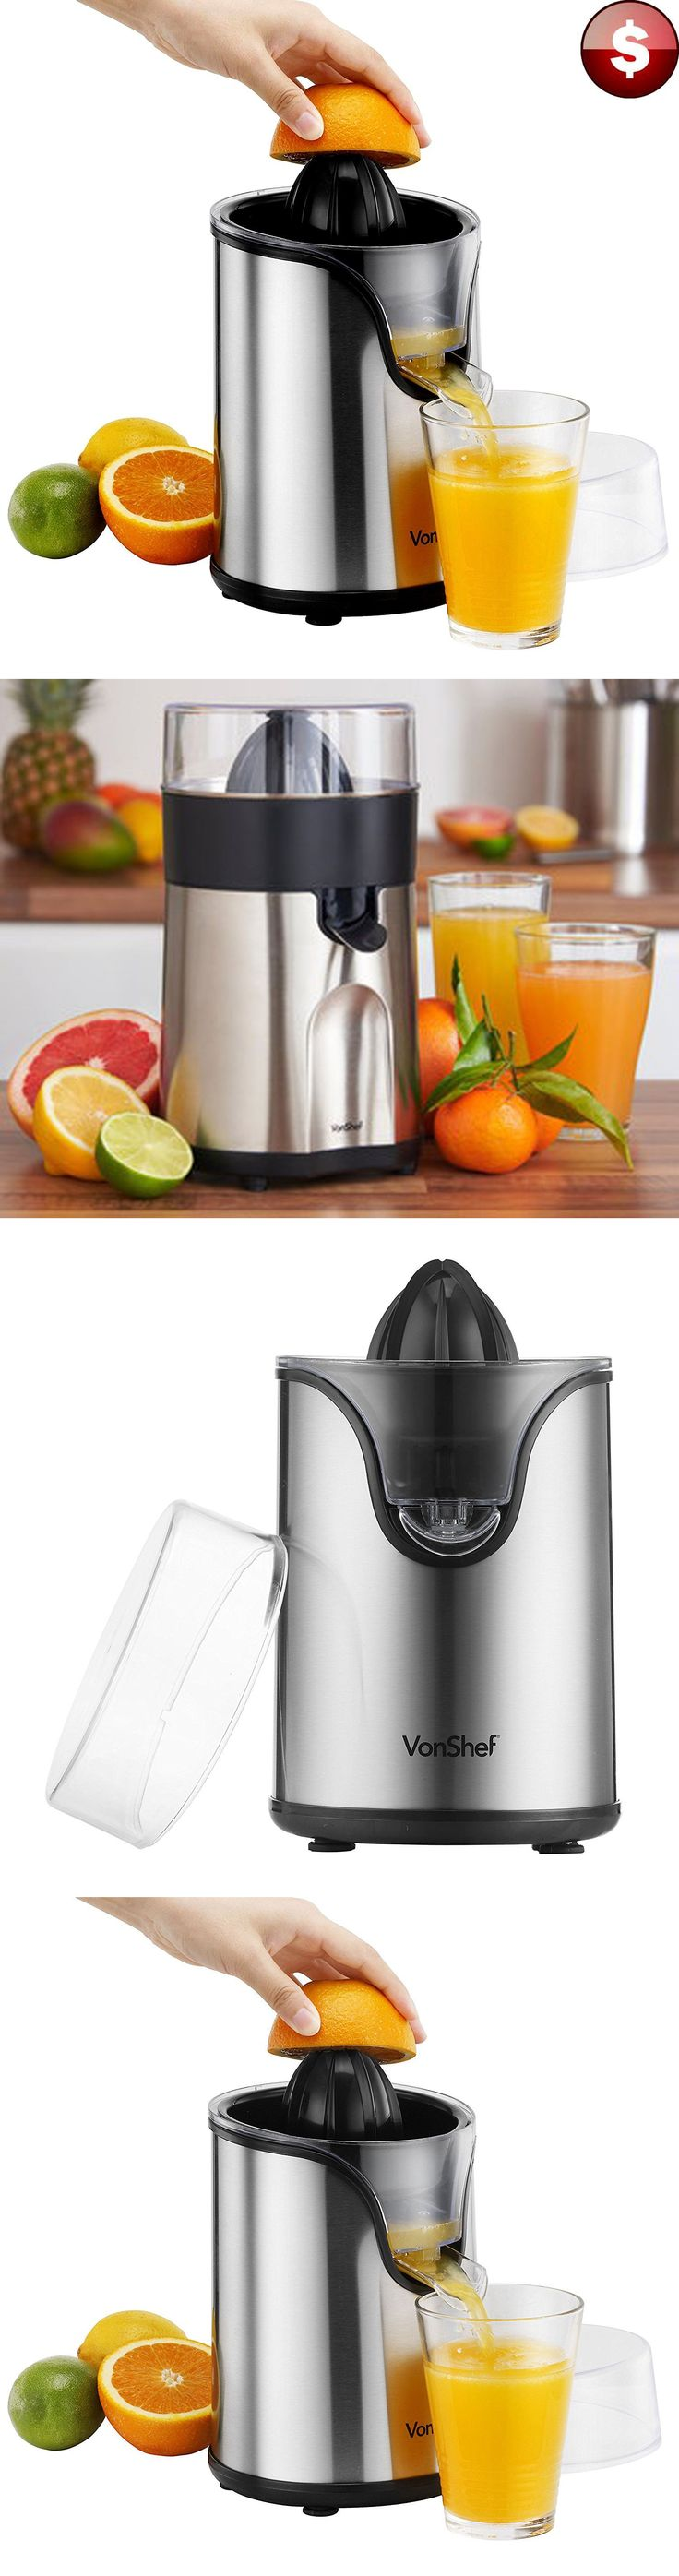 Kitchen small appliance circuit - Small Kitchen Appliances Electric Citrus Juicer Orange Fruit Lemon Squeezer Extractor Juice Press Machine Buy